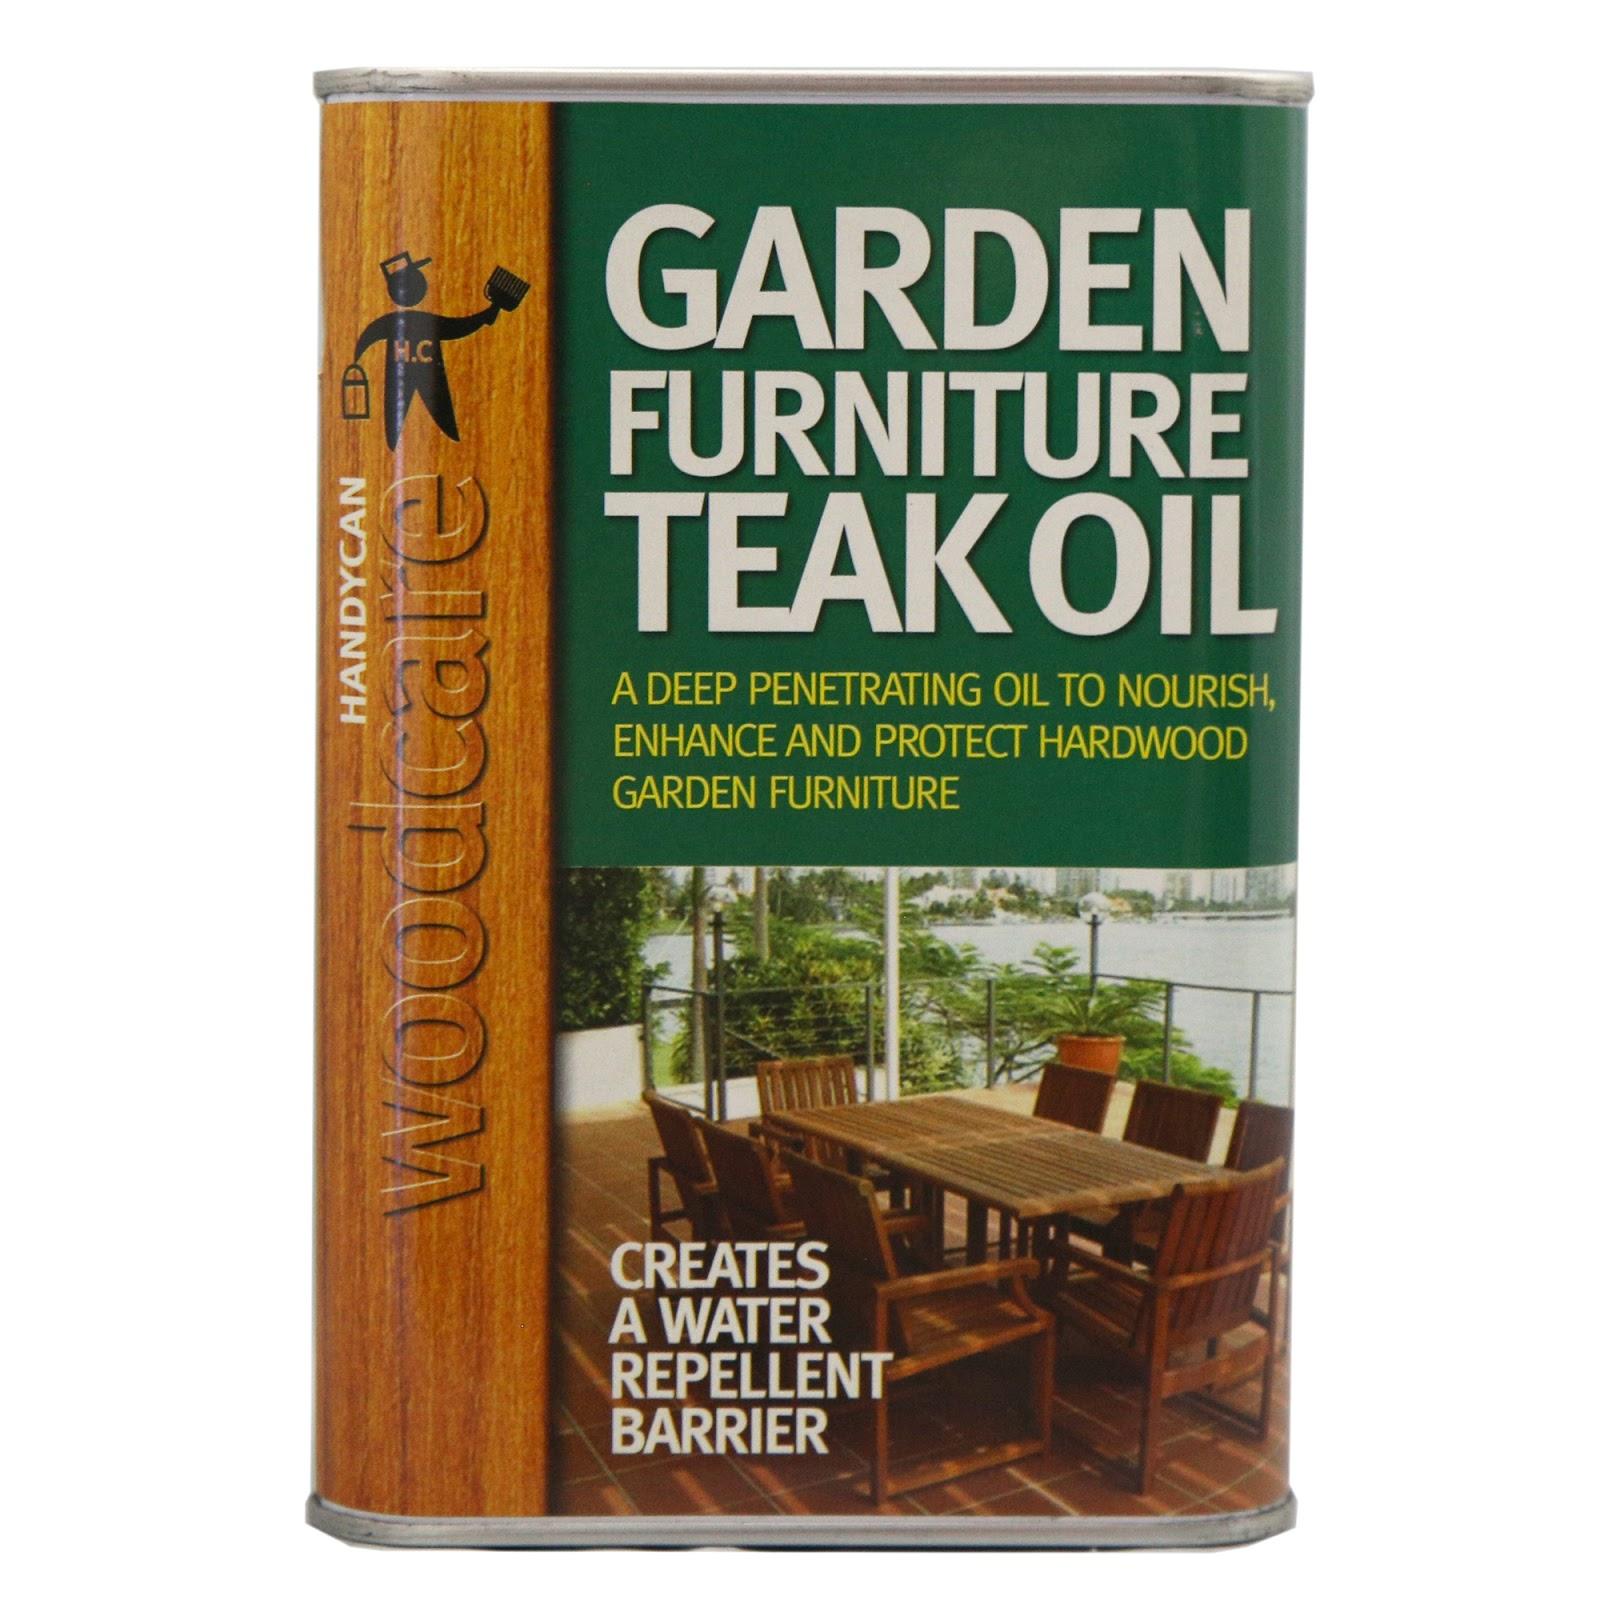 Survive the Elements: Handycan Garden Furniture TEAK Oil 10 Litre CLEAR